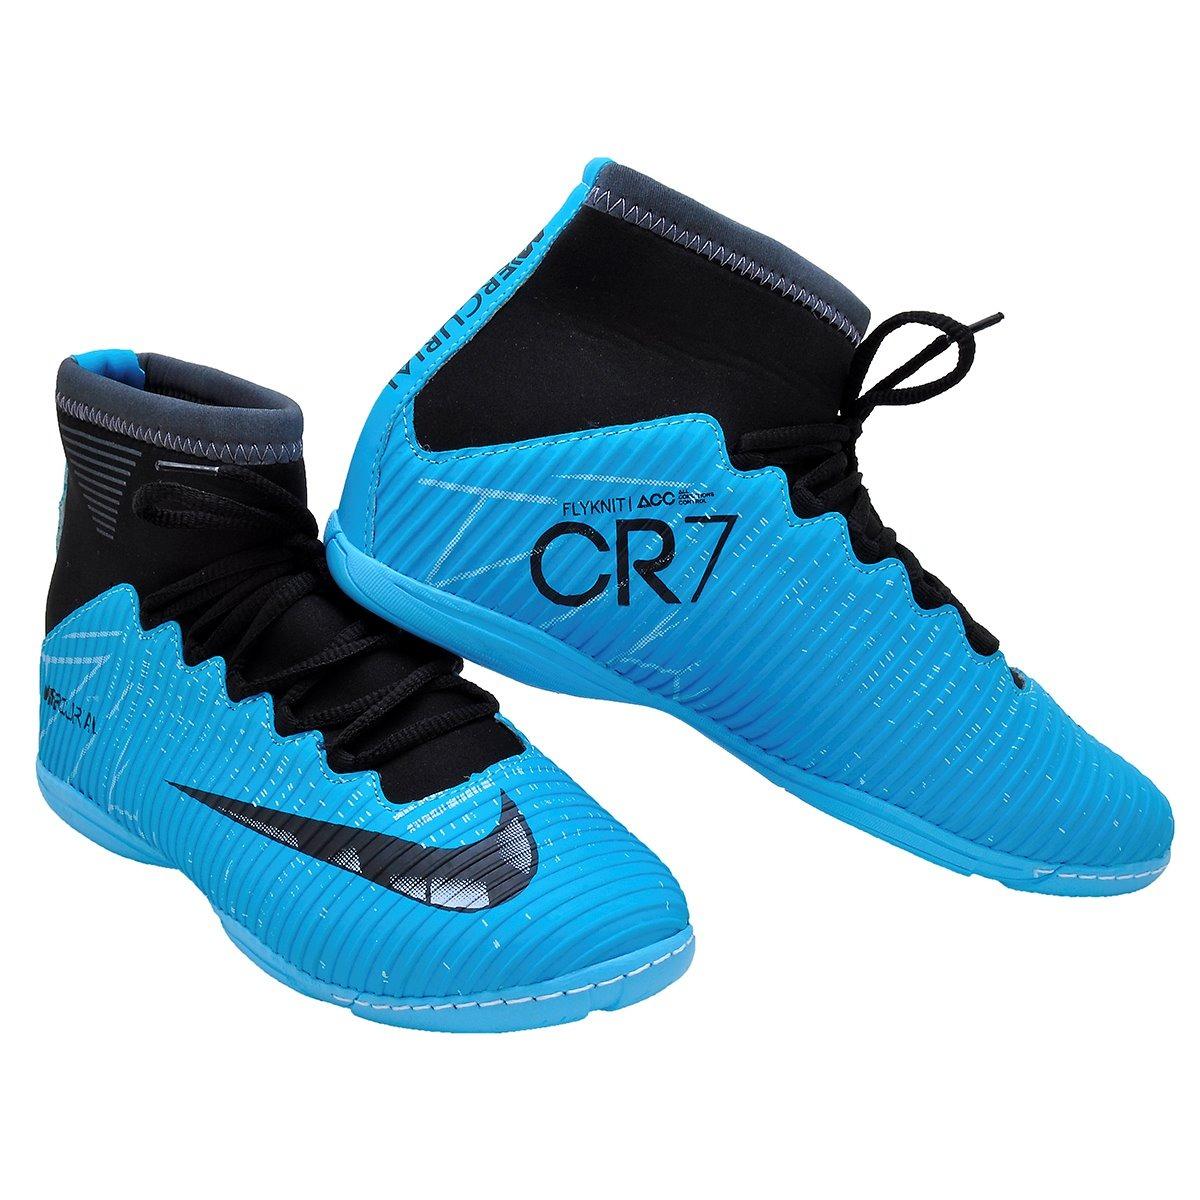 6fa4a9dcb31b6 Chuteira Nike Futsal Botinha Cr7 2 Pares Oferta - R  200